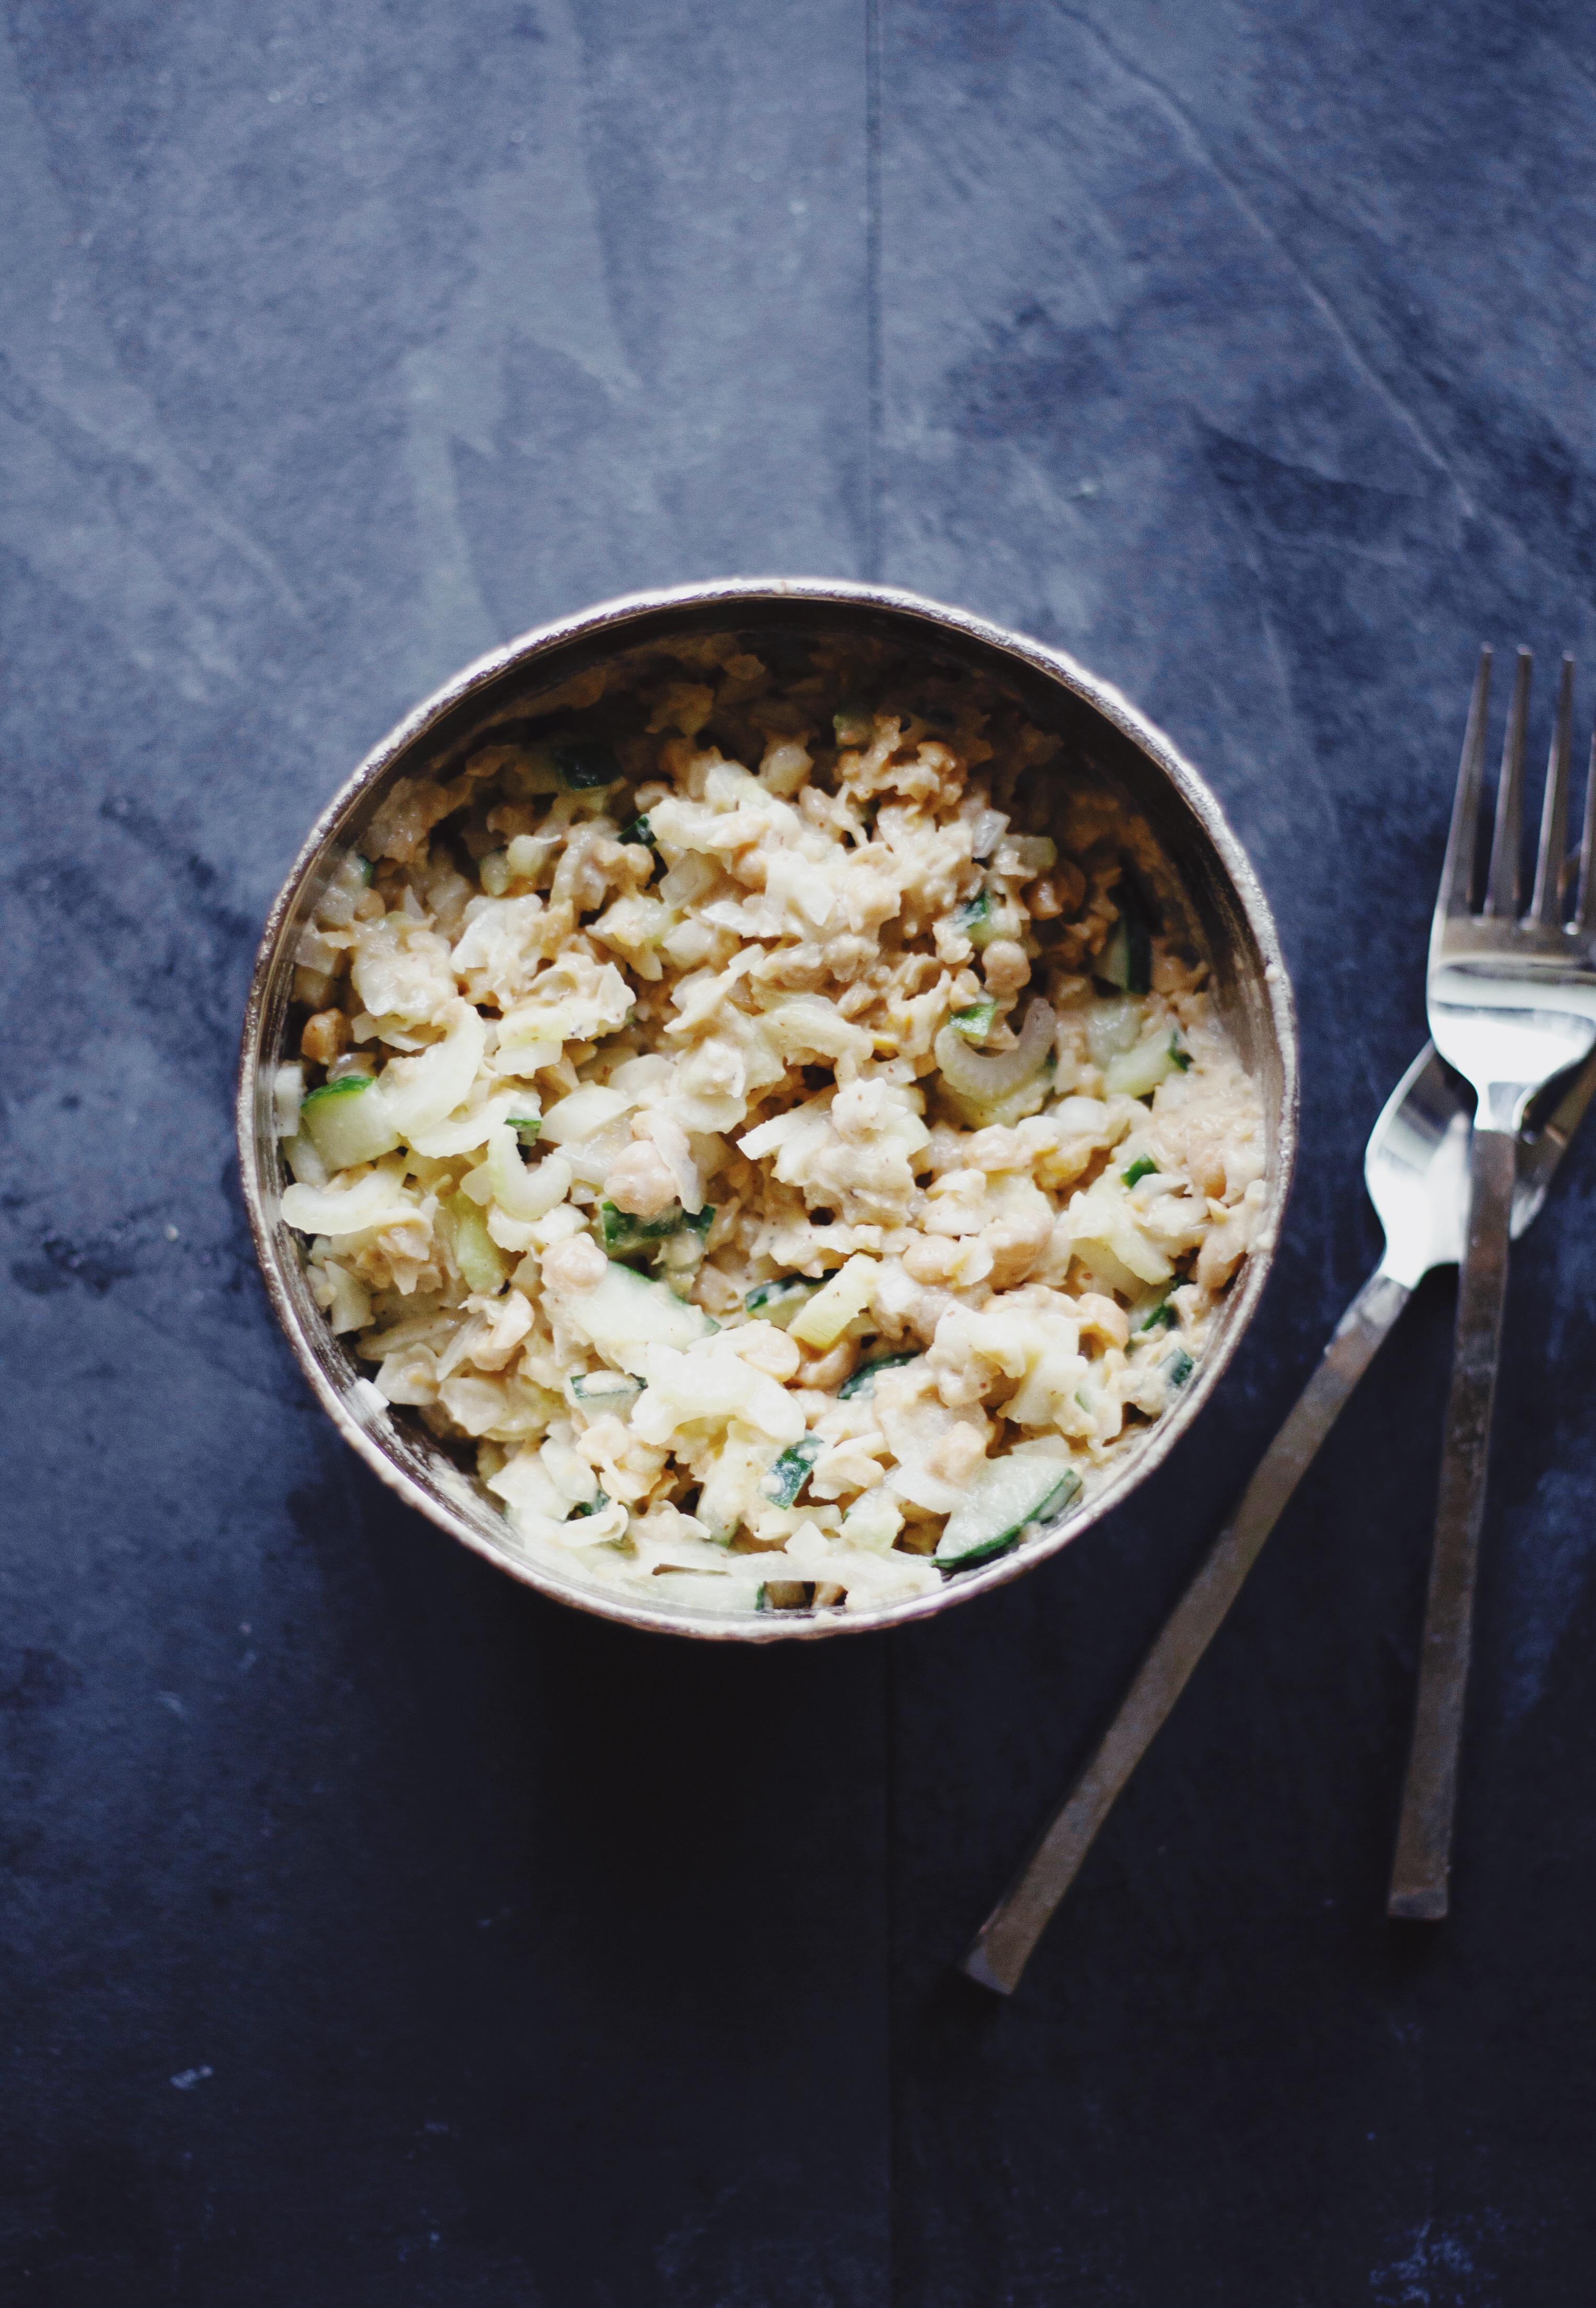 Healthy chickpea salad recipe. Vegan and gluten free